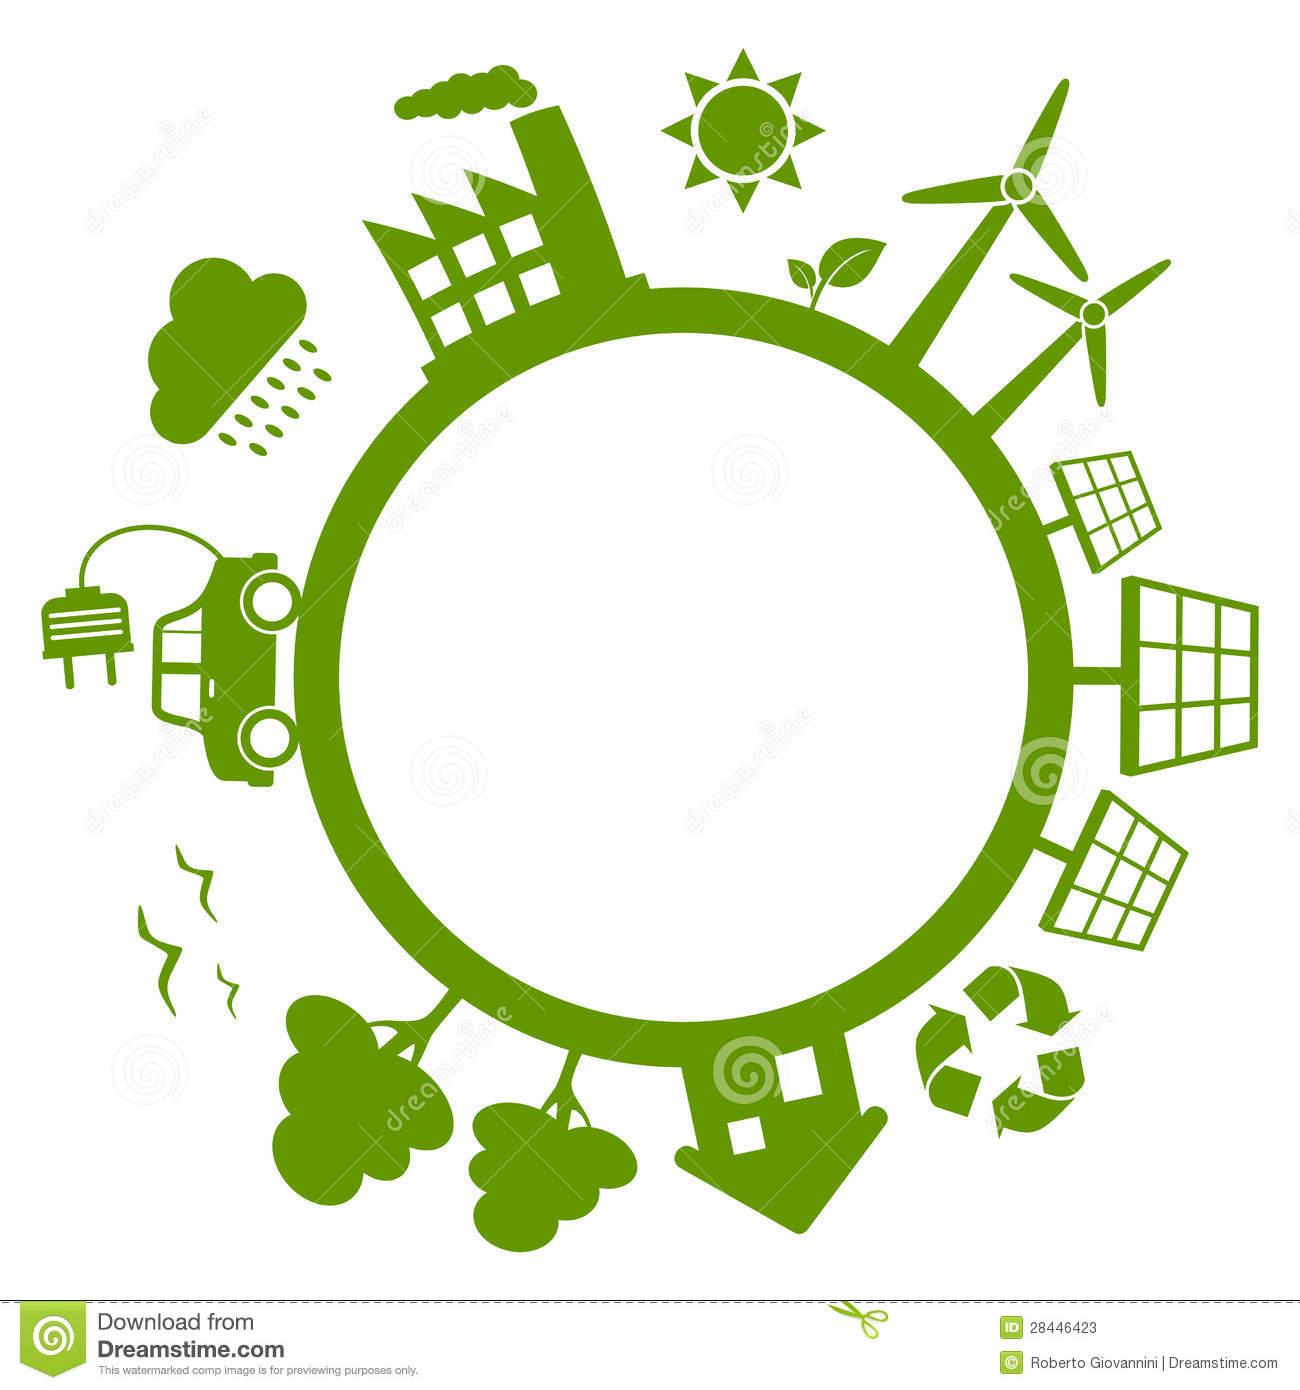 Green energy clipart.